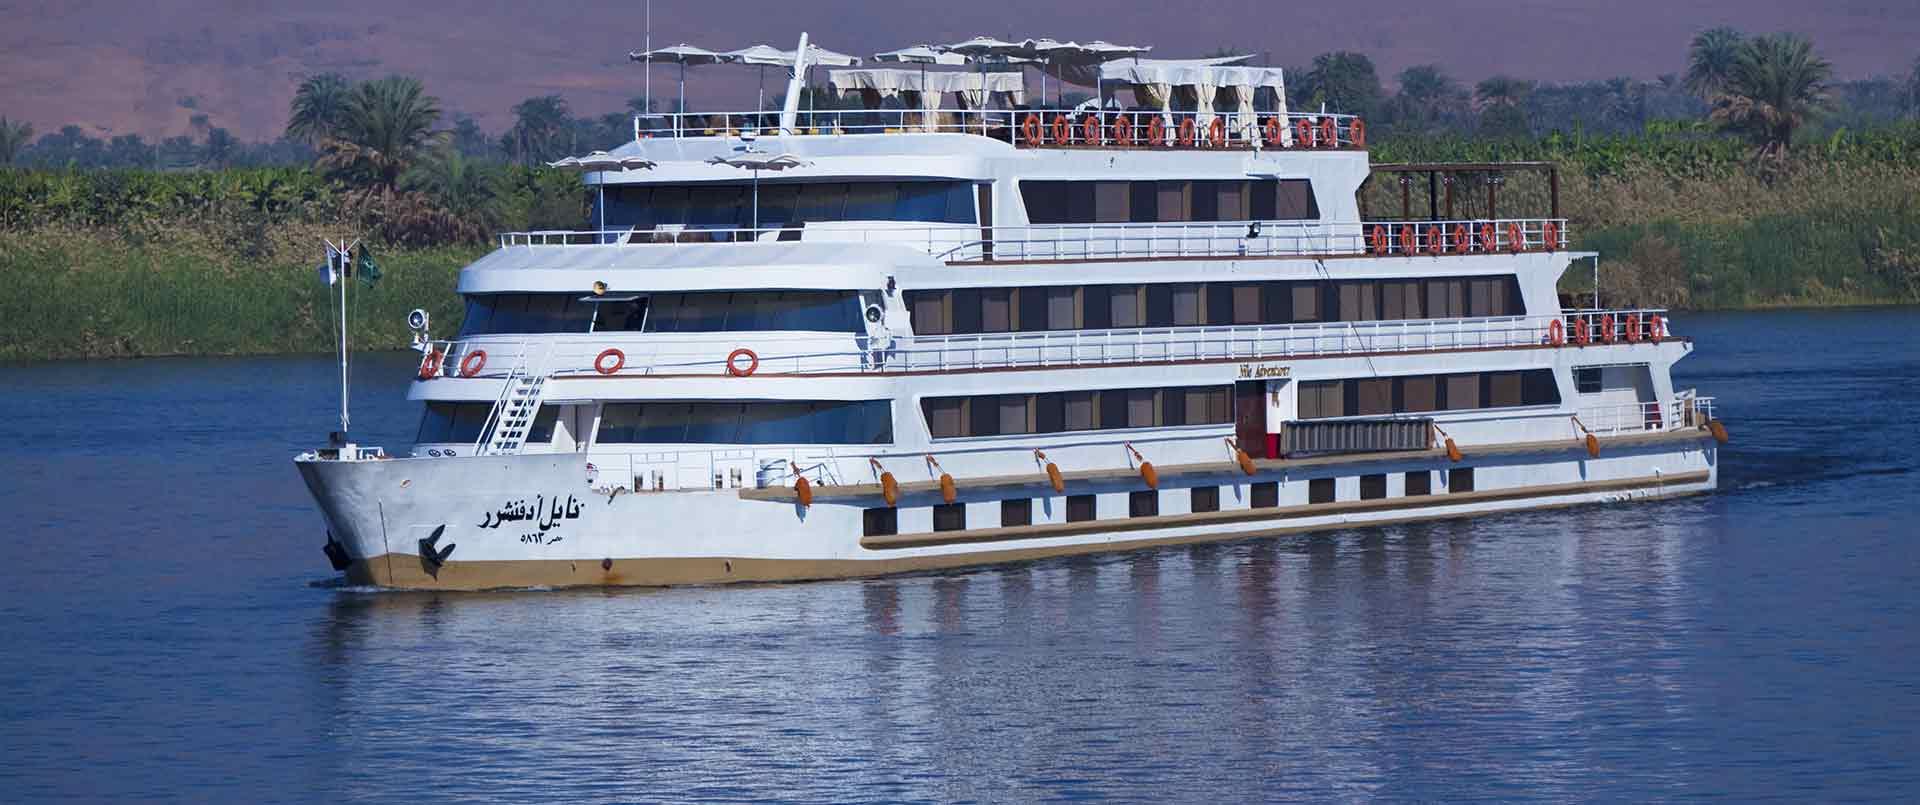 The Sanctuary Cruise